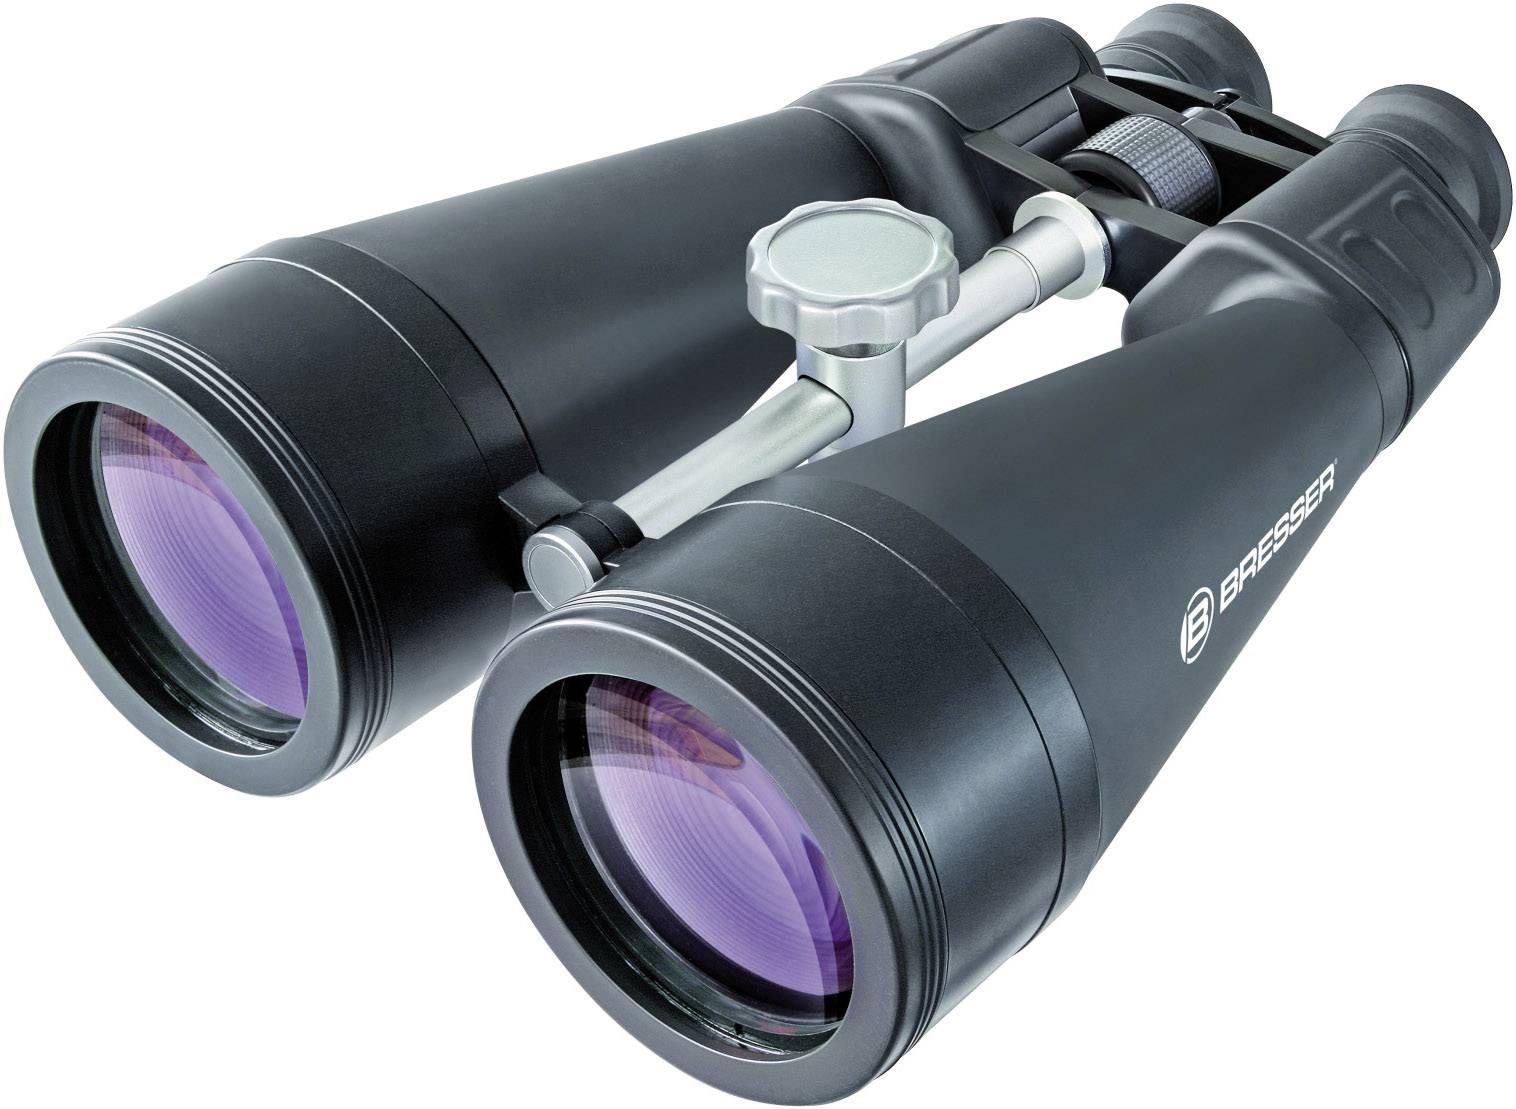 Bresser optik fernglas spezial astro mm porro schwarz